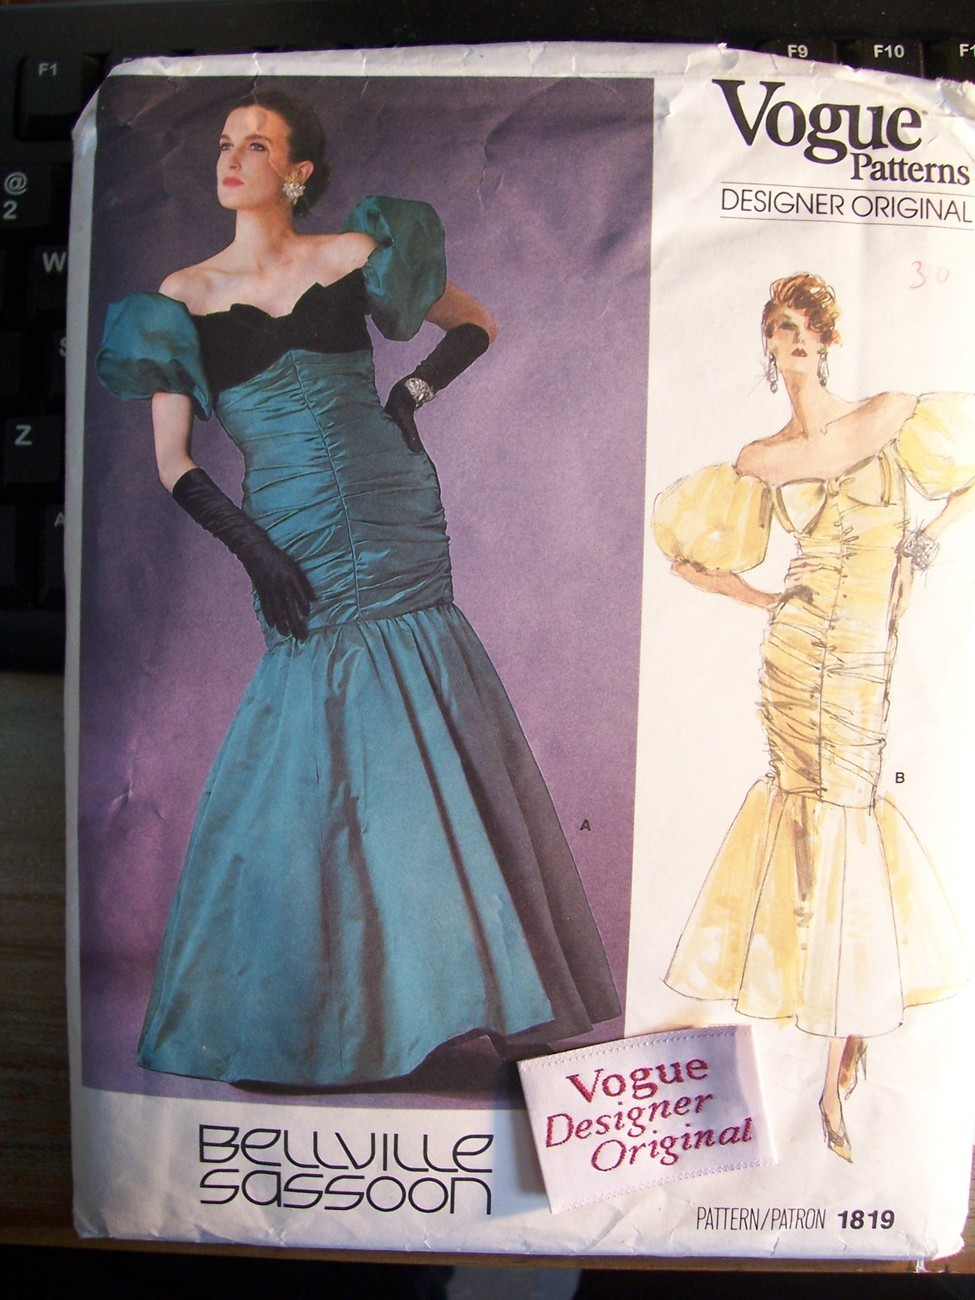 Vogue 1819 Designer Bellville Sasson Evening Dress 1986 Label ~ 8/31.5